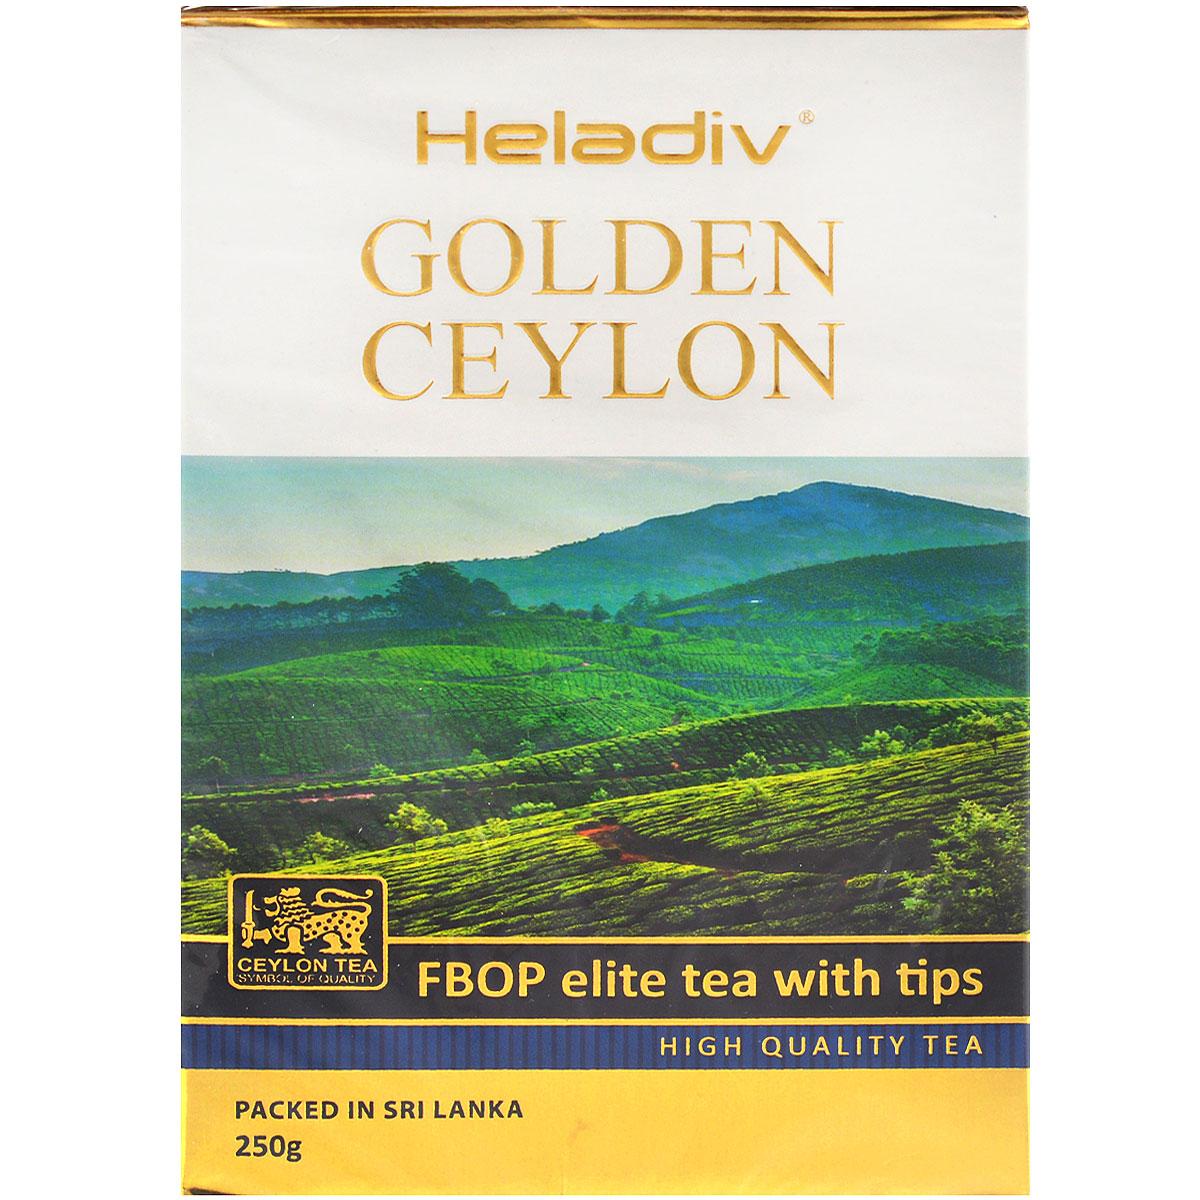 Heladiv Golden Ceylon Fbop Elite Tea with Tips черный листовой чай, 250 г 2015 arrival vacuum pack lapsang souchong canton village black tea 500g ceylon assam premium selection count special pearl milk